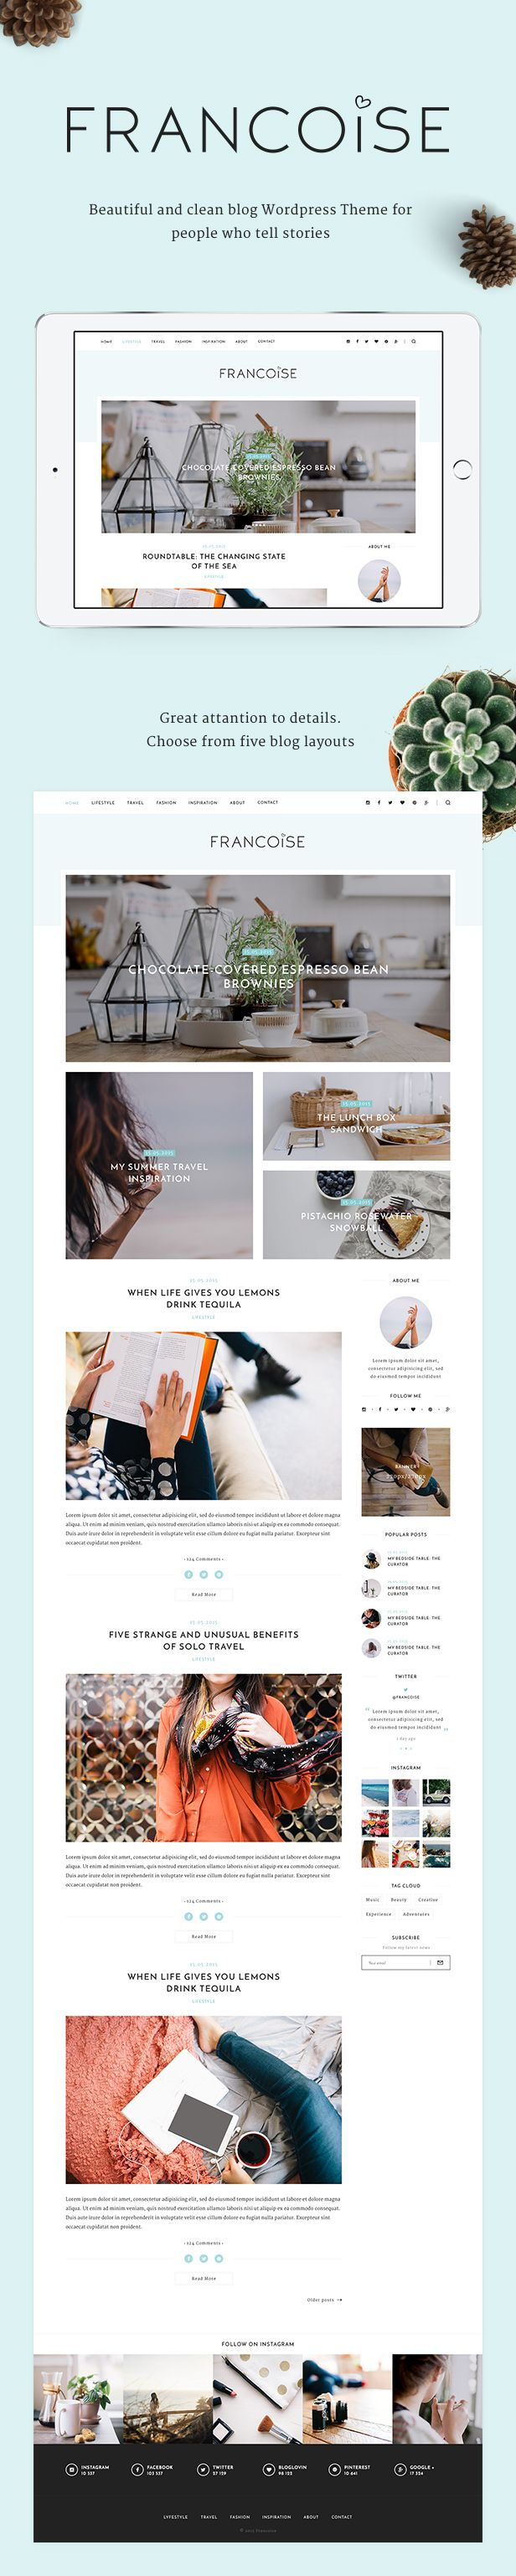 Francoise - Personal WordPress Blog Theme - WordPress | ThemeForest